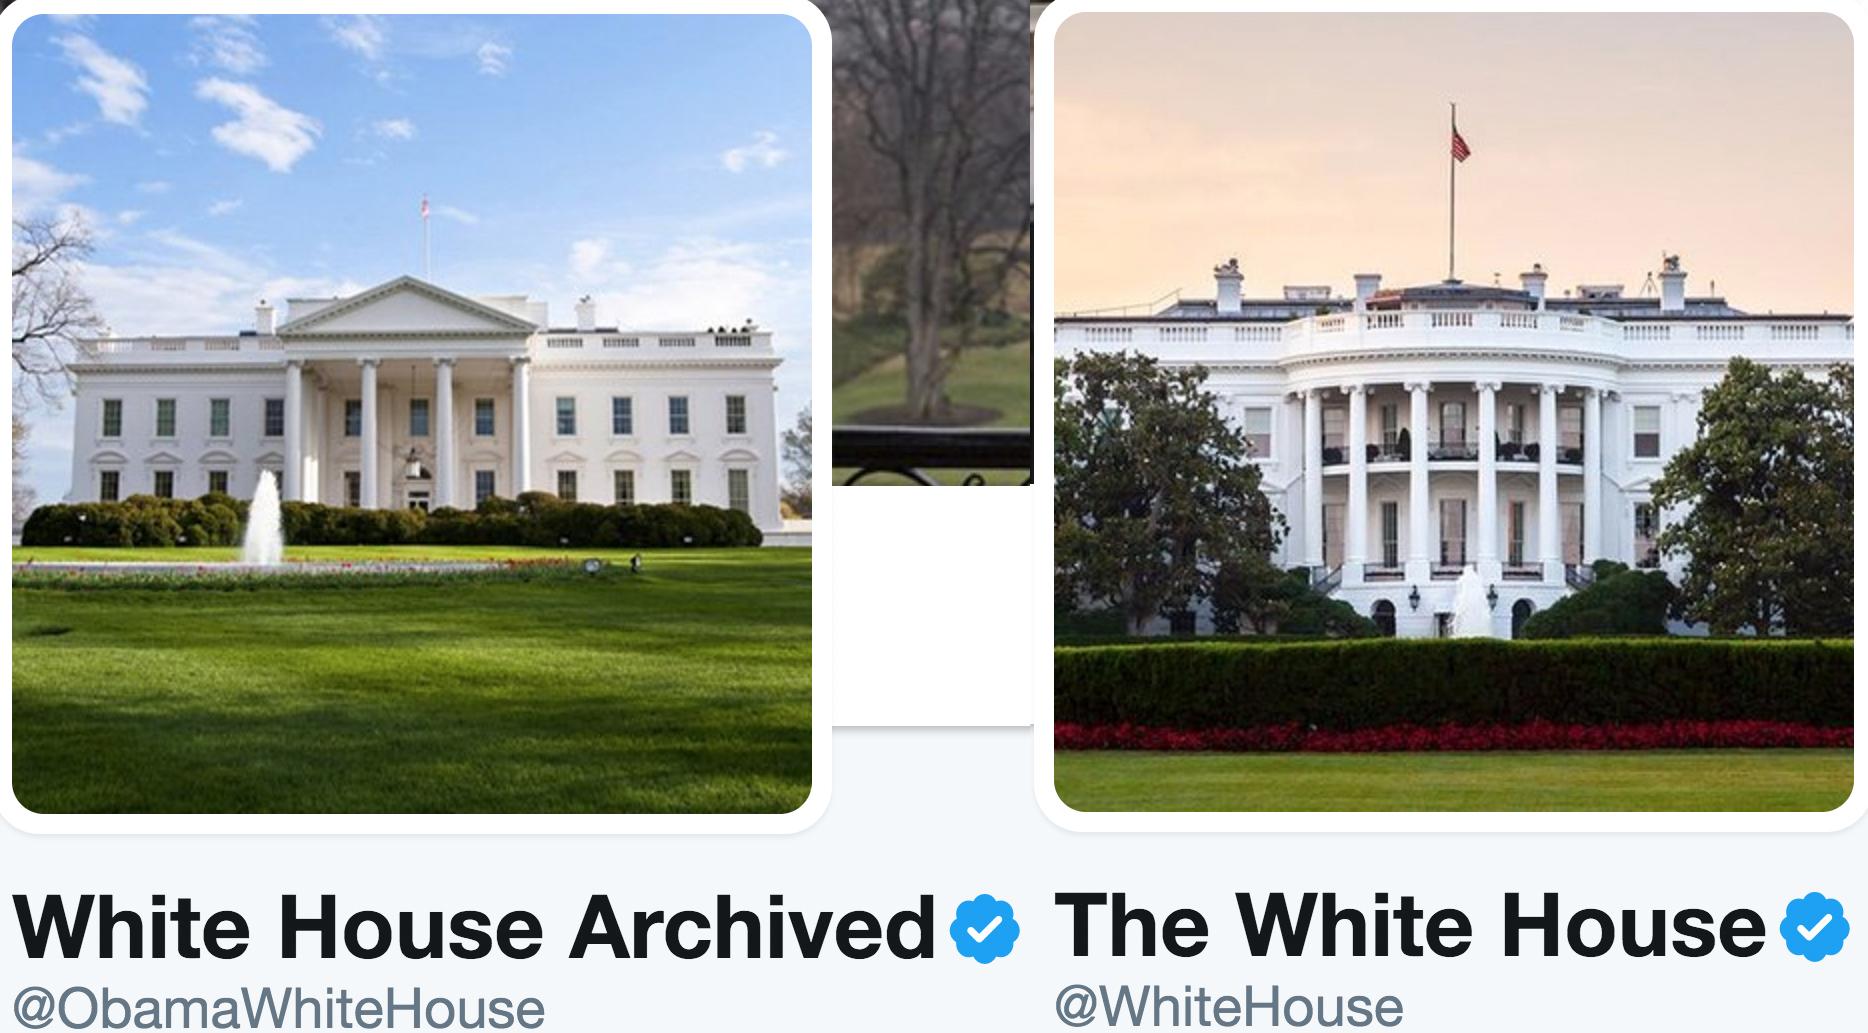 White House Twitter Photo